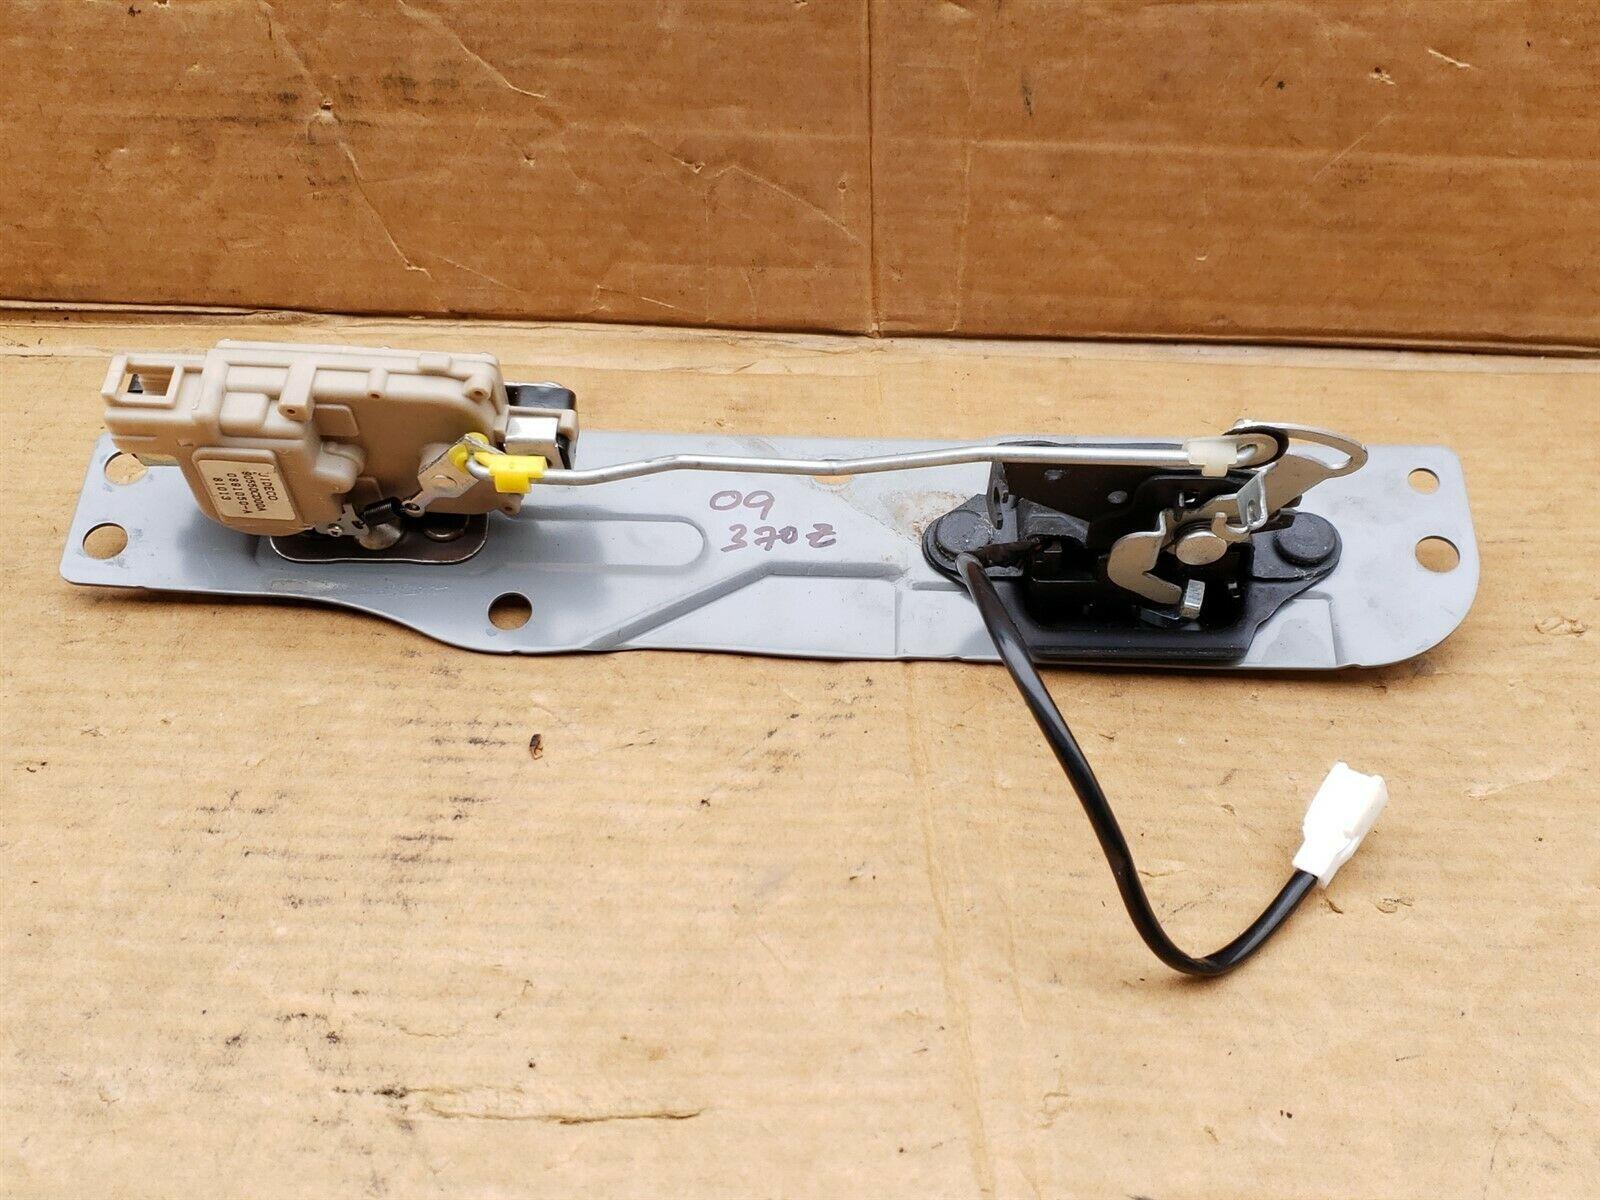 08-12 Nissan 370z Trunk Lid Liftgate Release Lock Power Actuator Motor & Latch